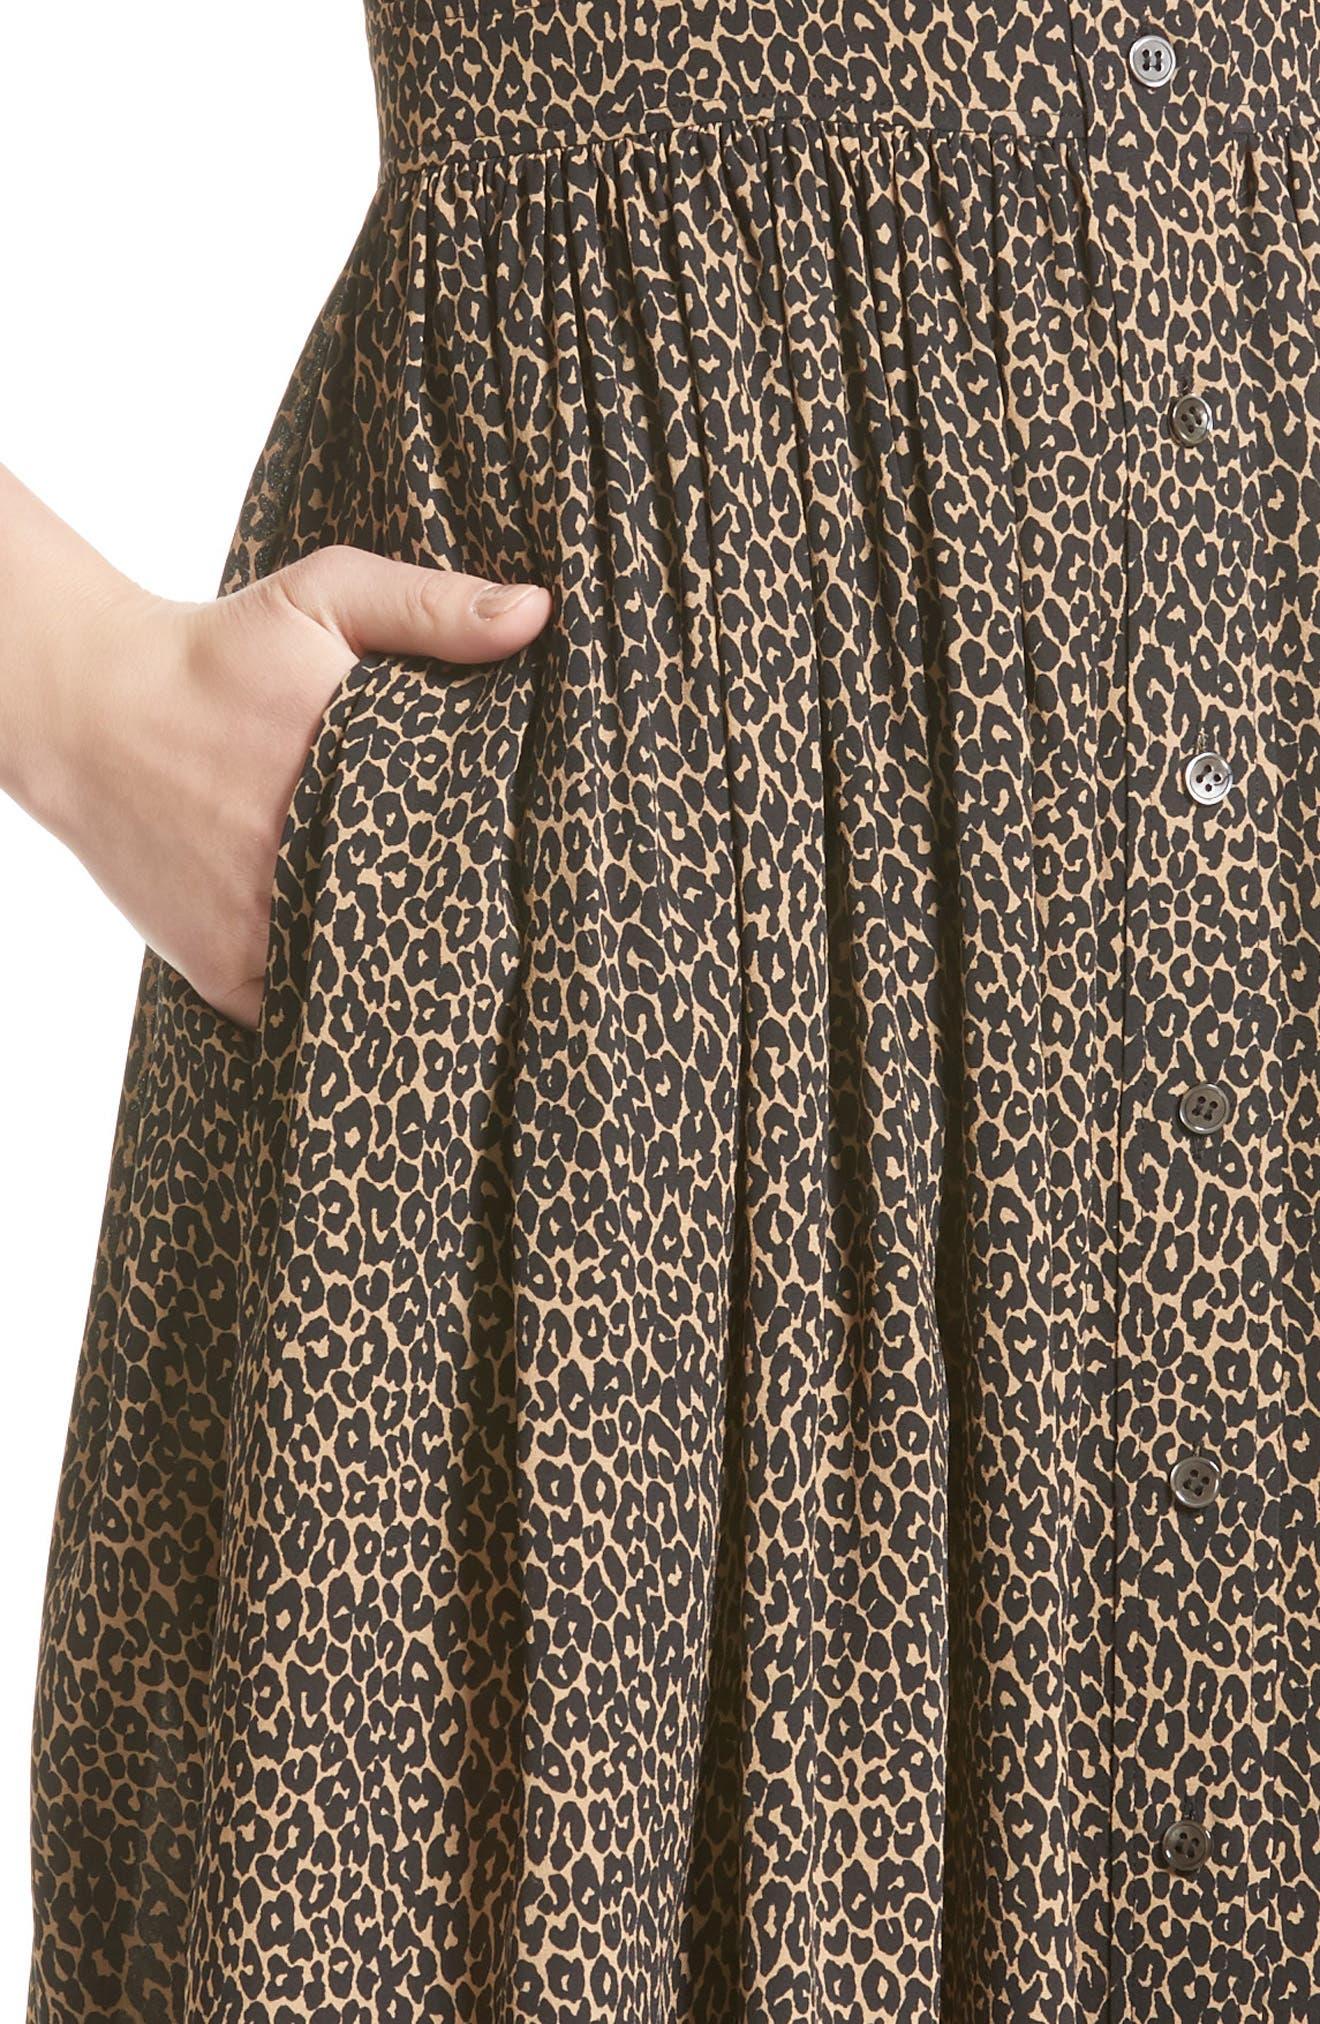 Leopard Print Silk Georgette Shirtdress,                             Alternate thumbnail 4, color,                             200